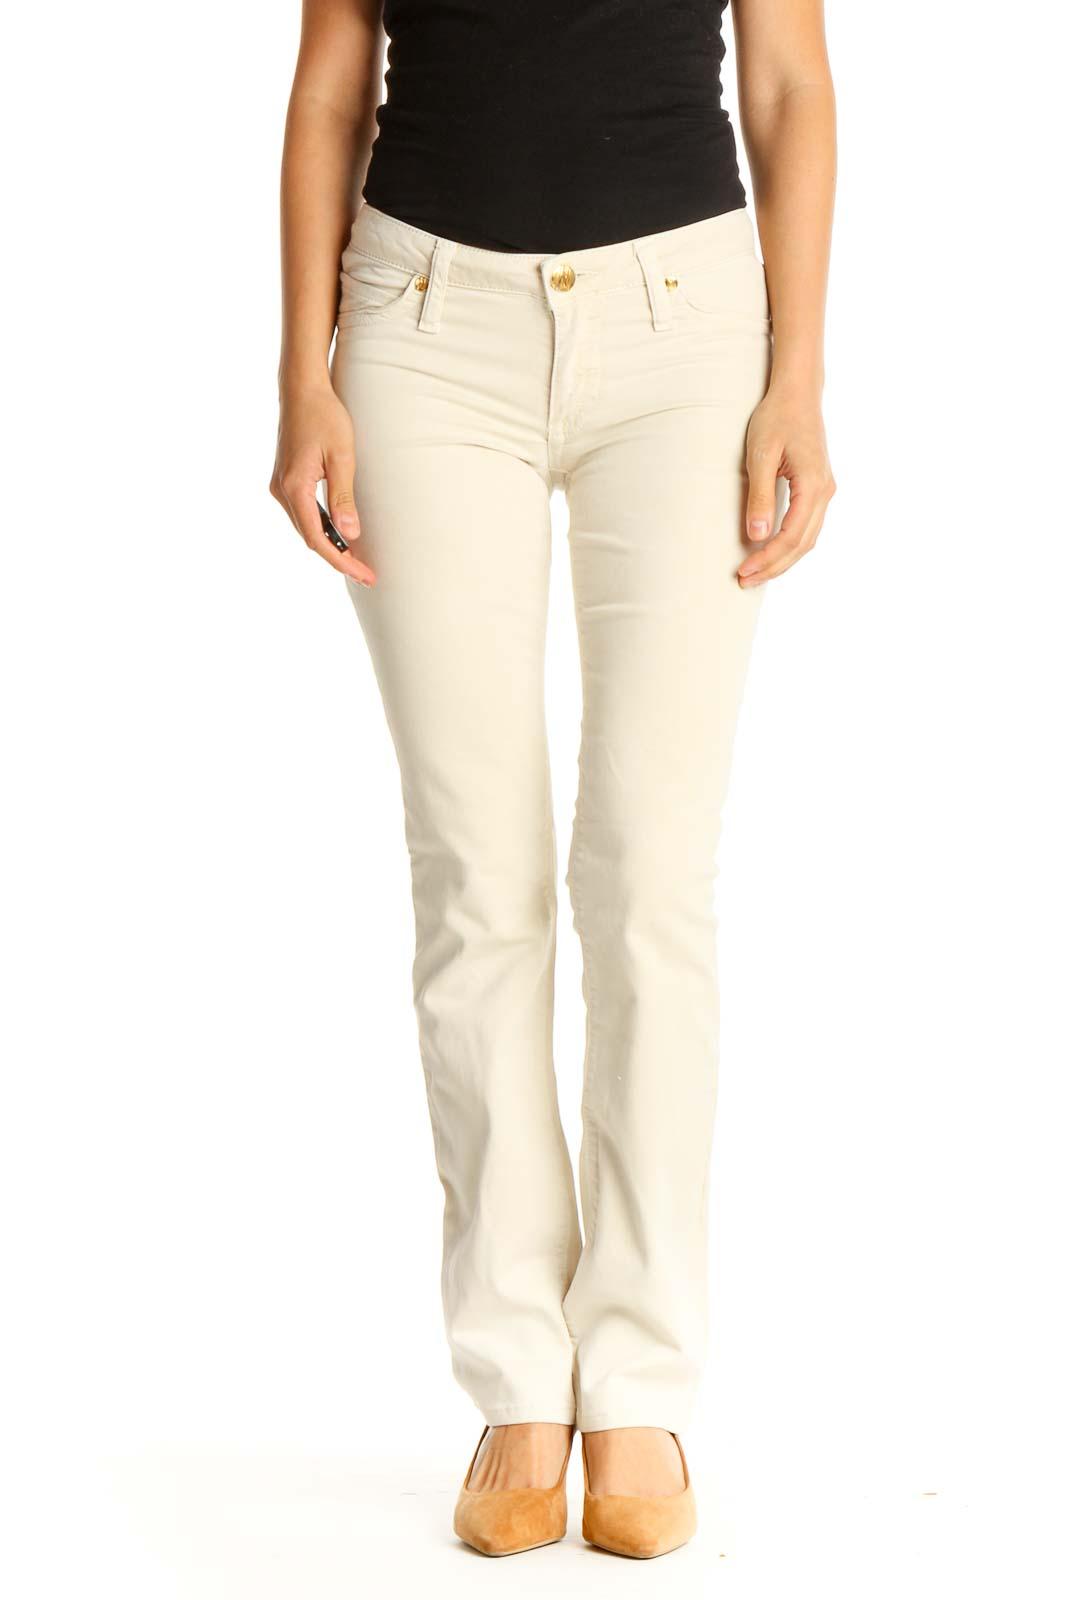 Beige All Day Wear Pants Front